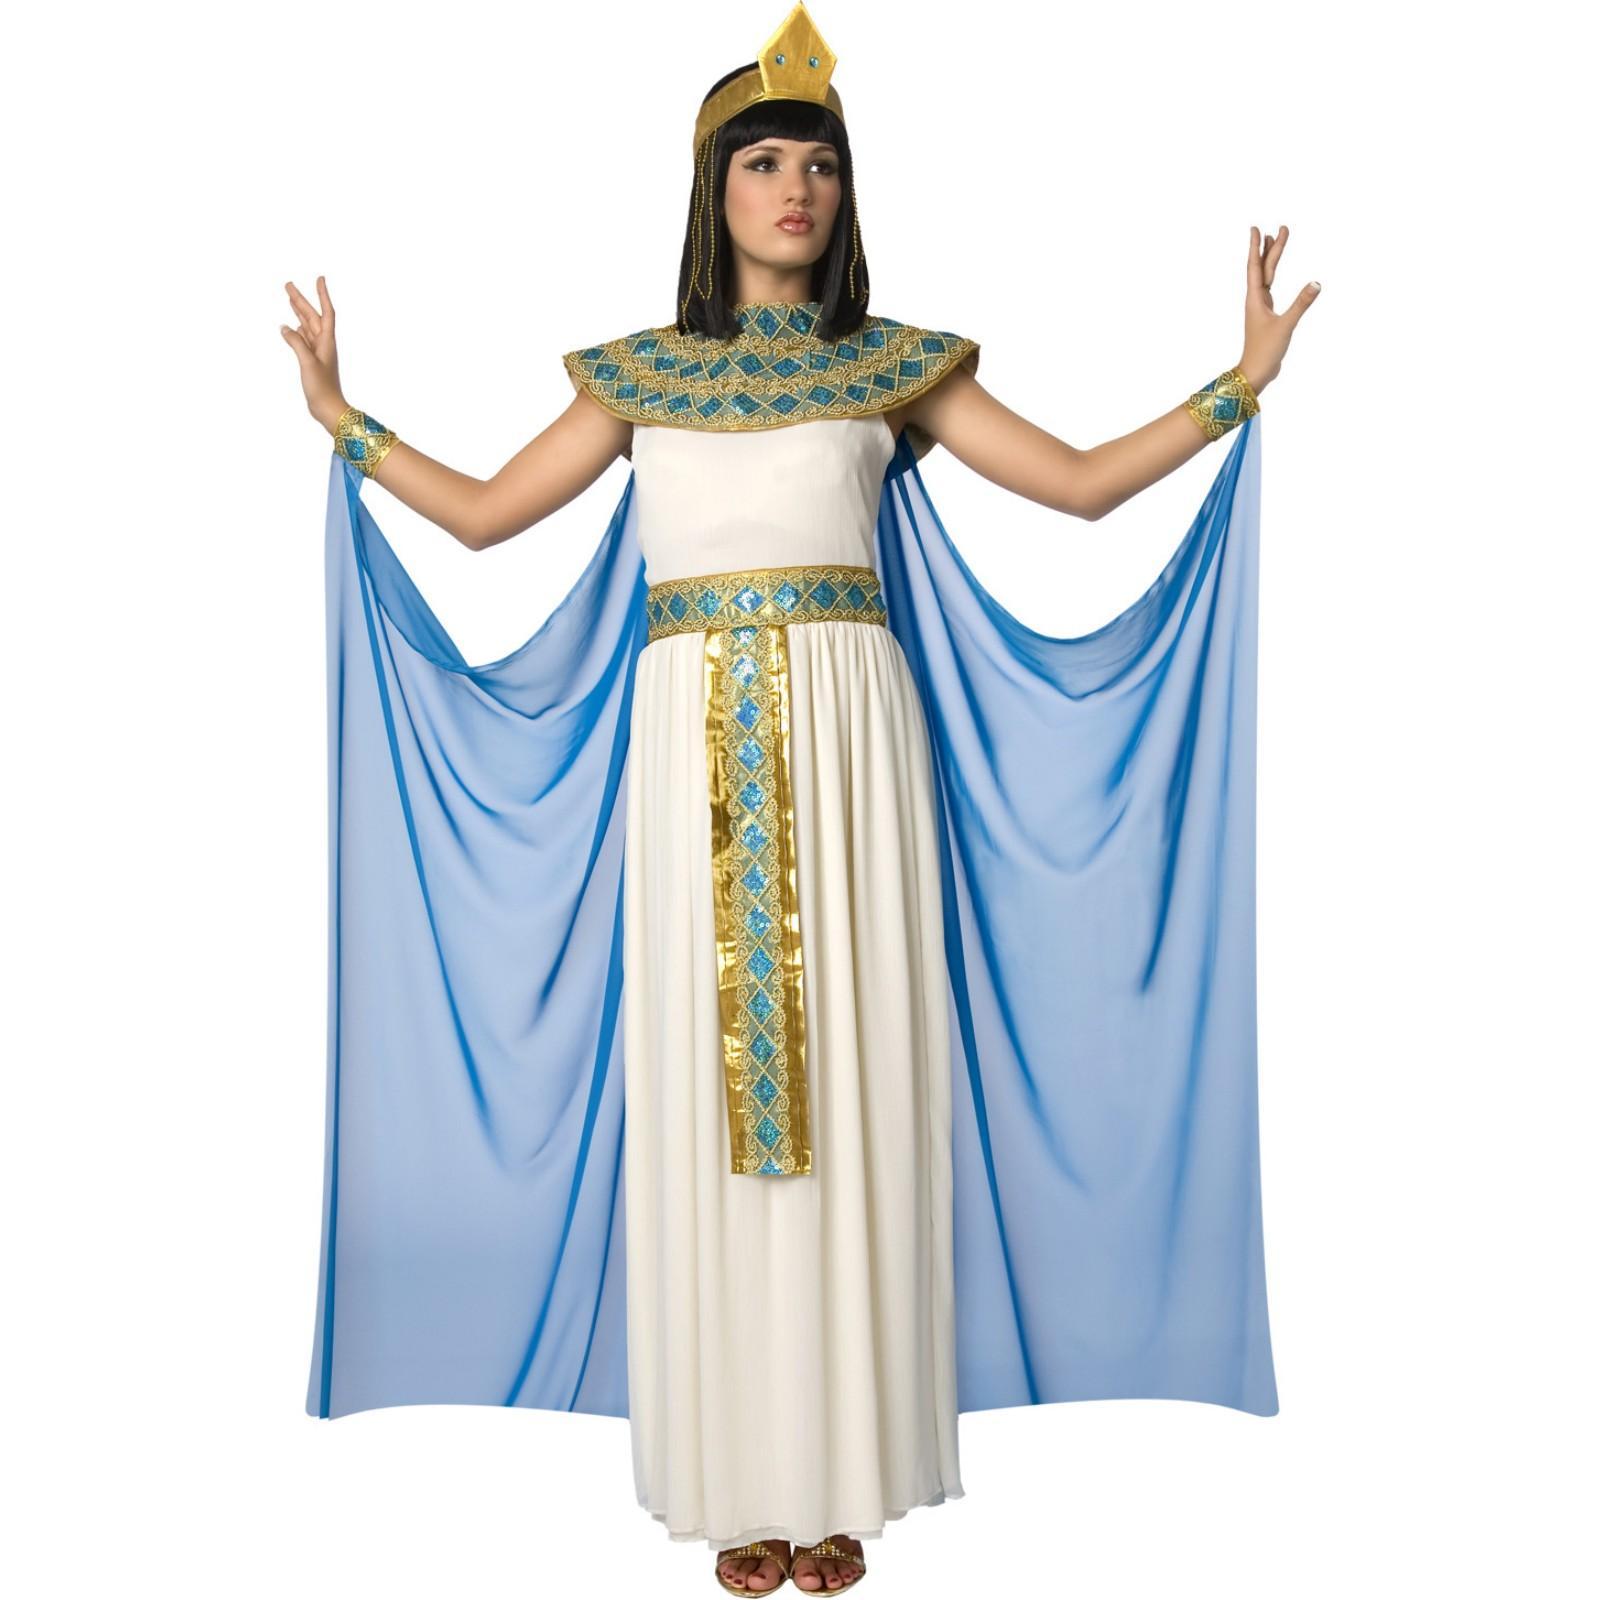 238 Best Egyptian Fashion Images On Pinterest Ancient Egypt Kawasaki Gpz 400 Wiring Diagram